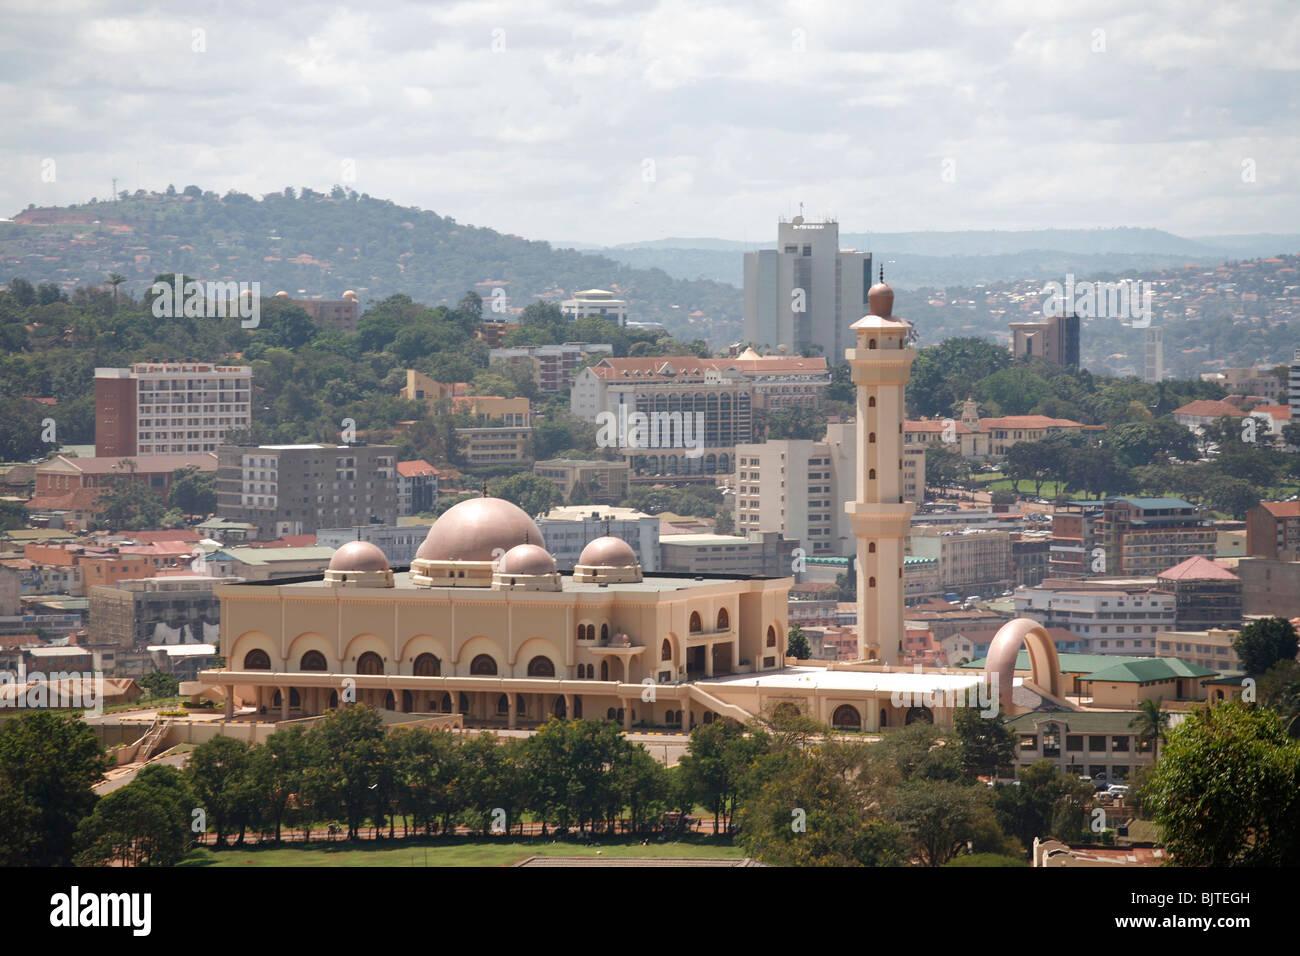 Colonel Gaddafi mosque in Kampala. Uganda - Stock Image